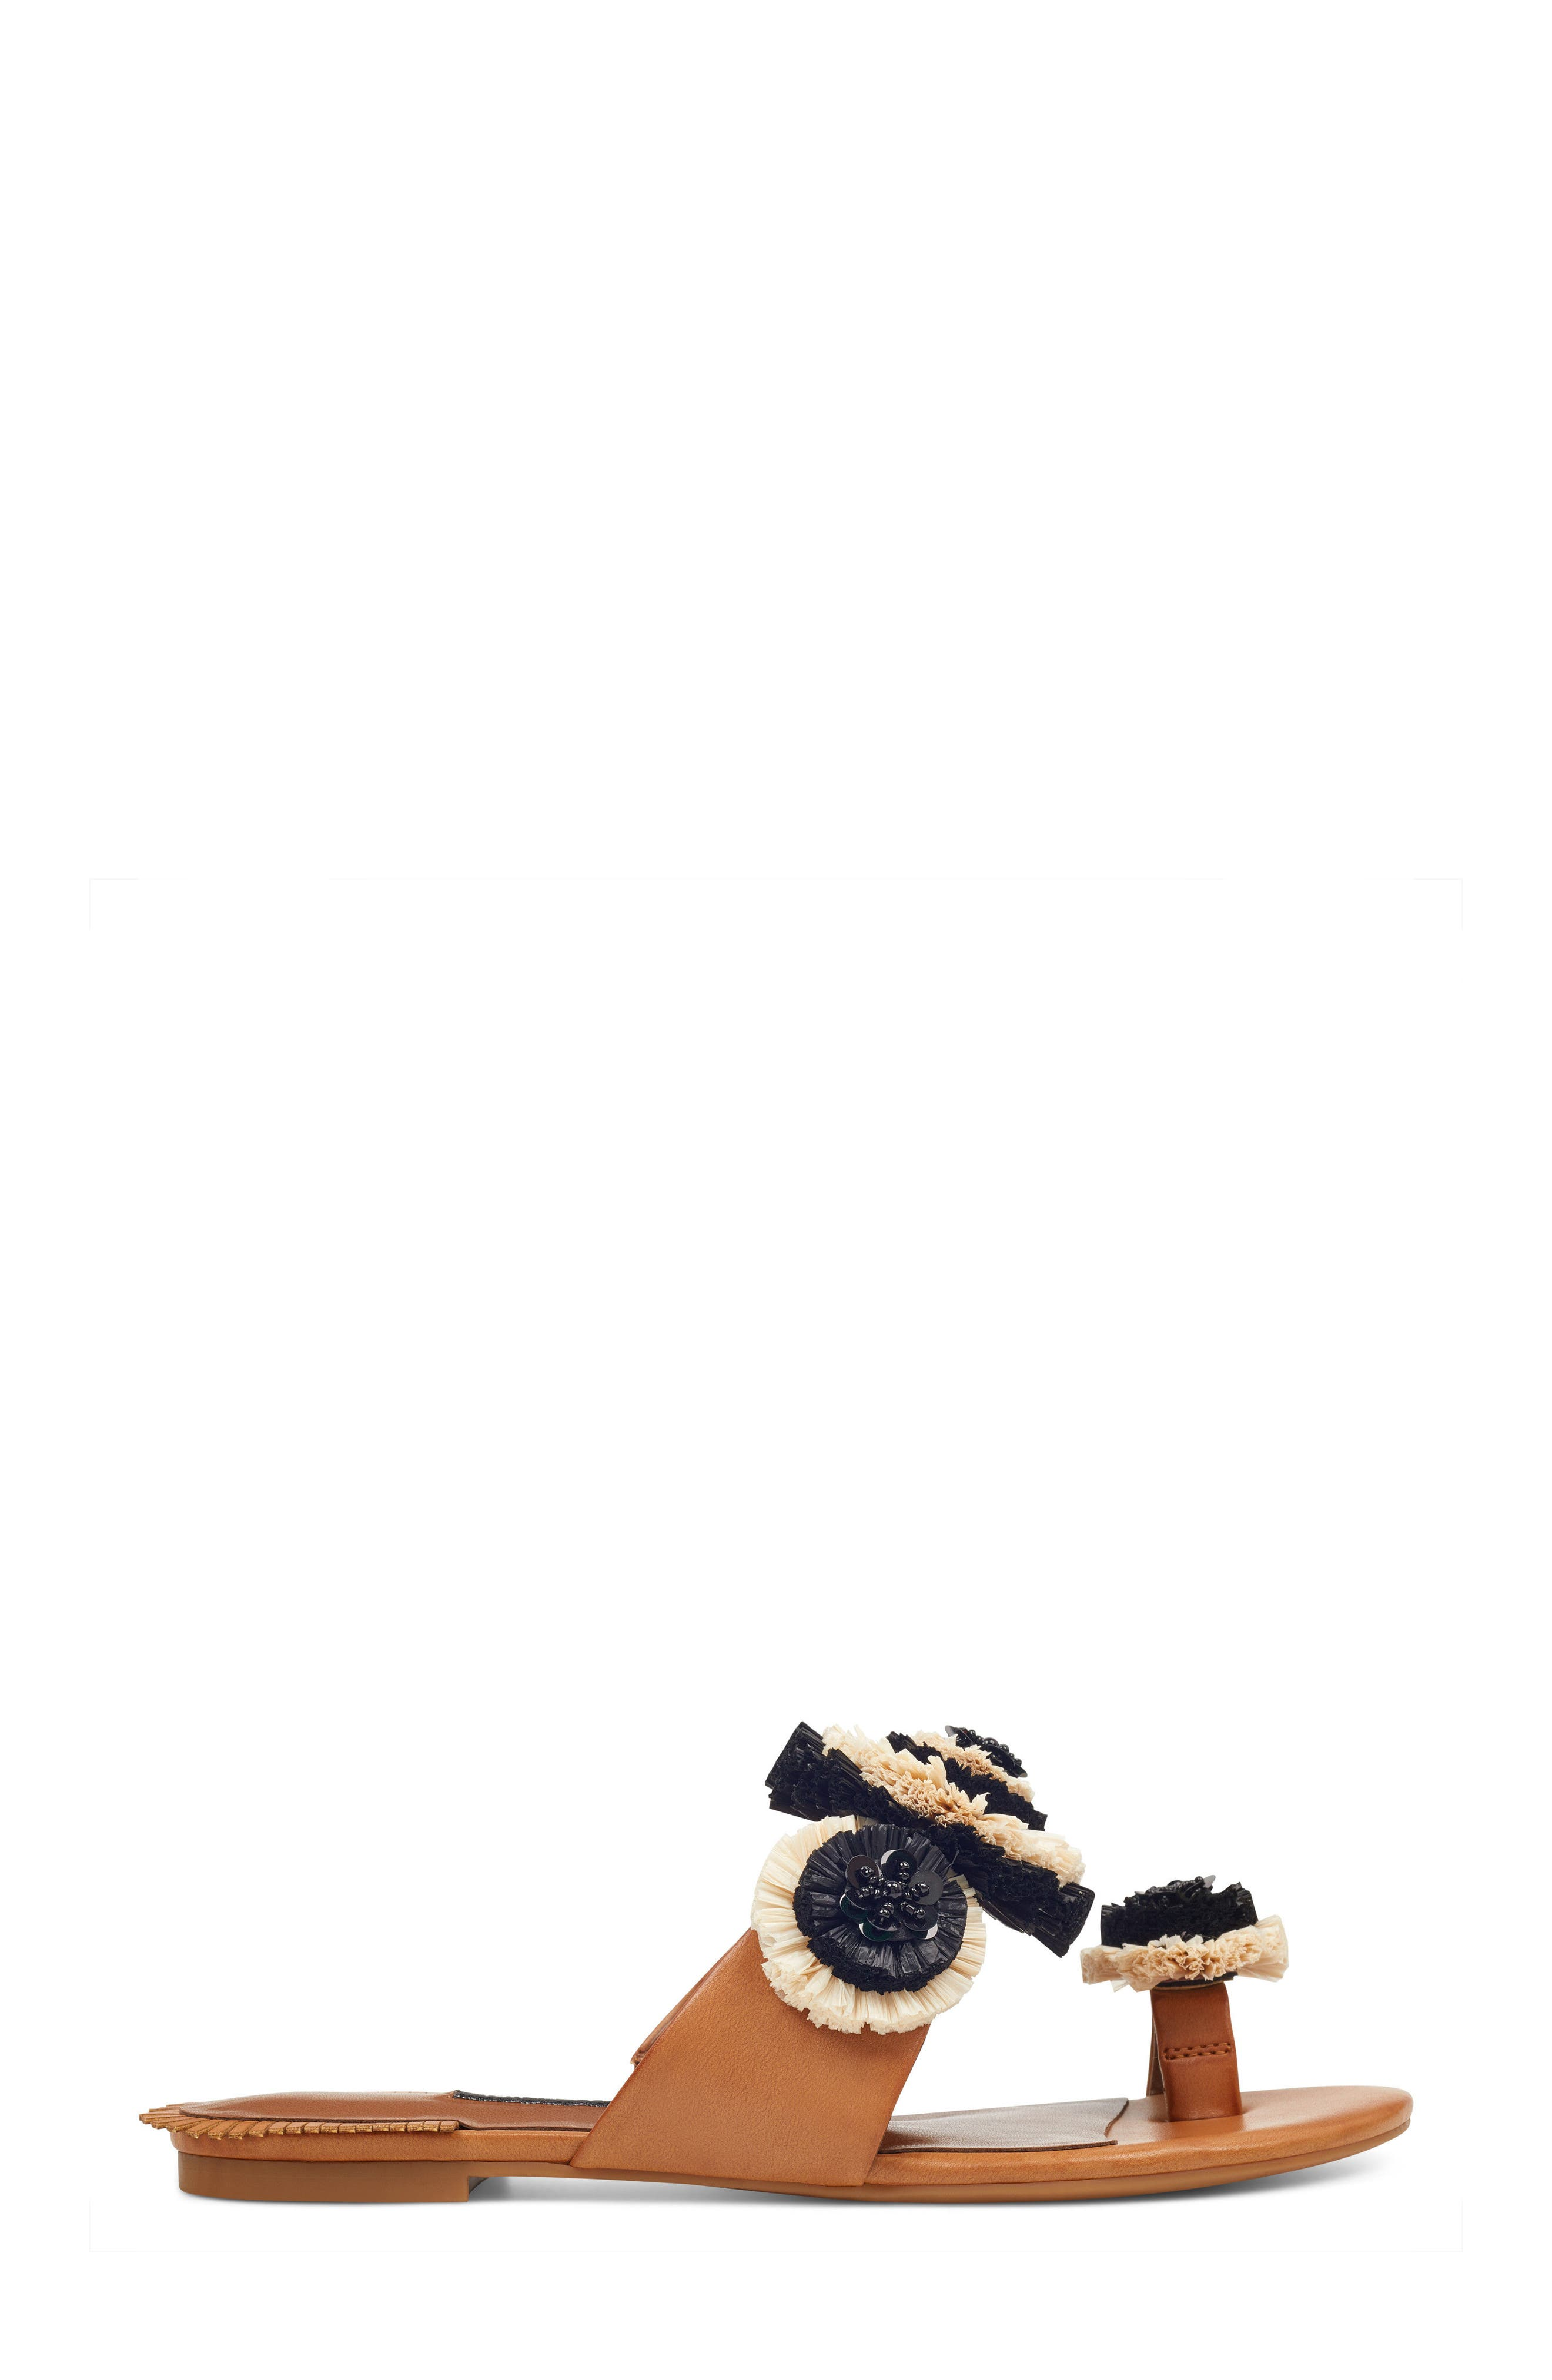 Sendran Raffia Flower Sandal,                             Alternate thumbnail 3, color,                             Dark Natural Faux Leather